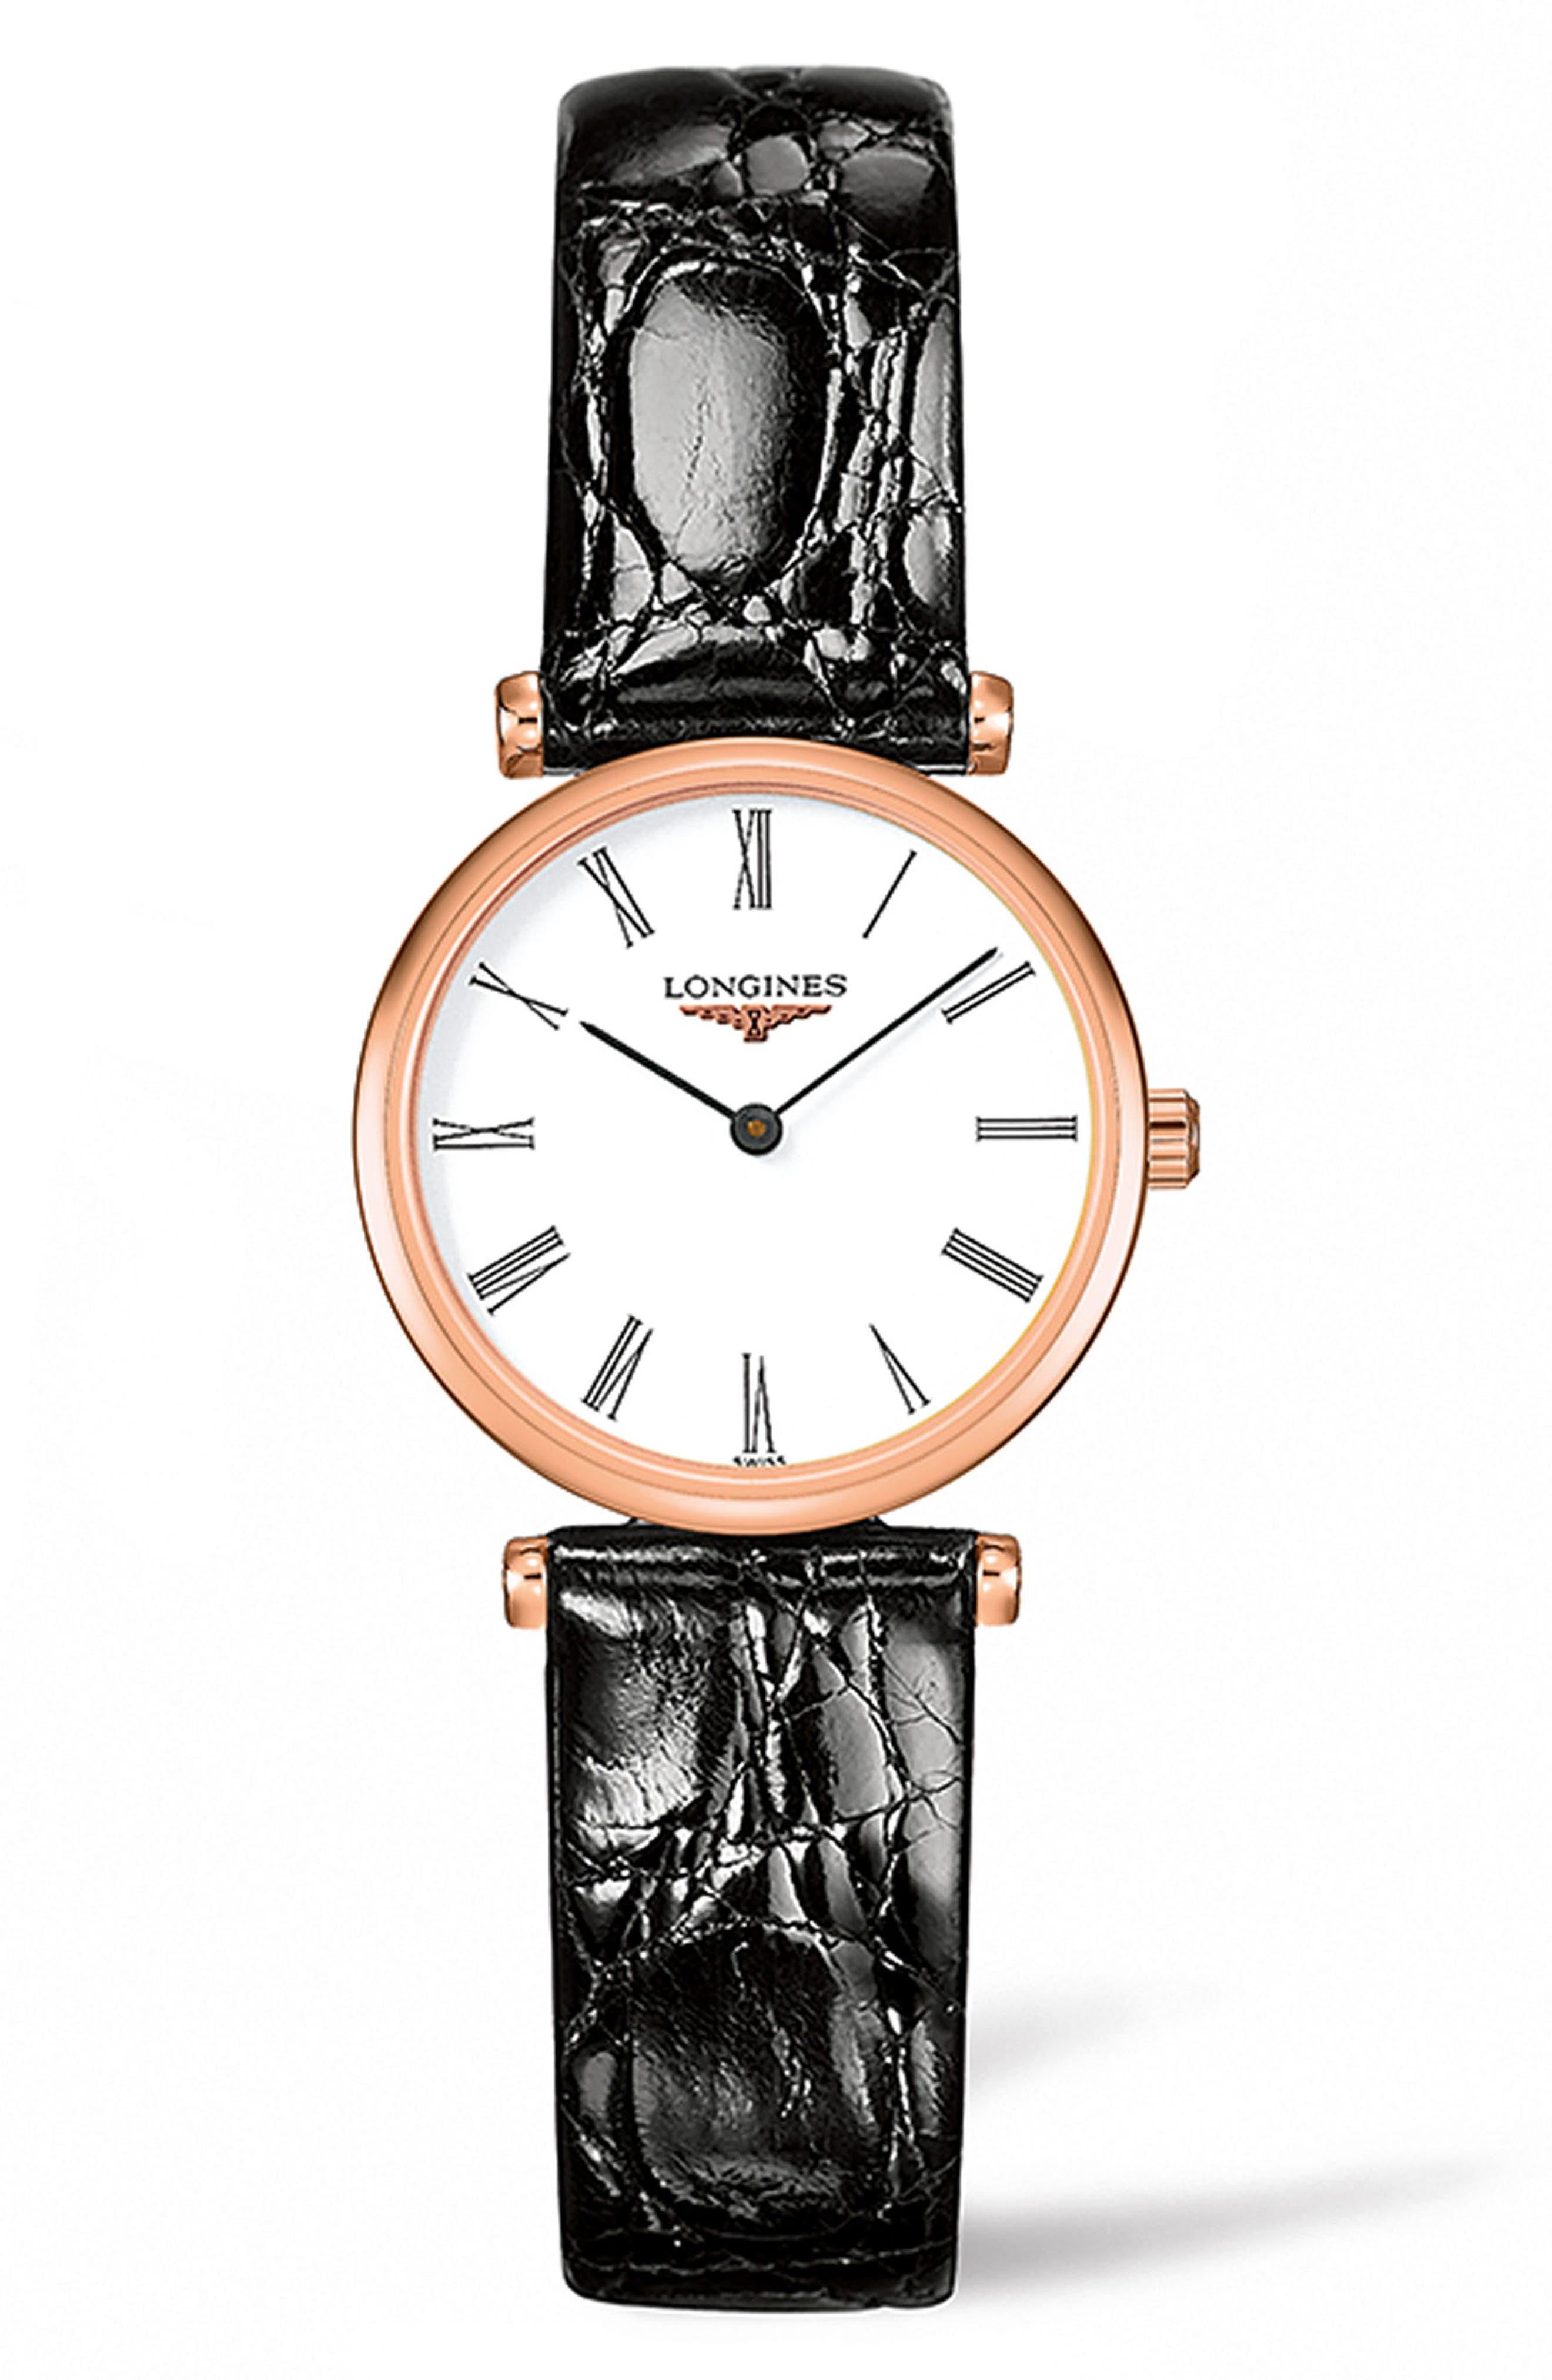 Main Image - Longines La Grande Classique de Longines Leather Strap Watch, 24mm